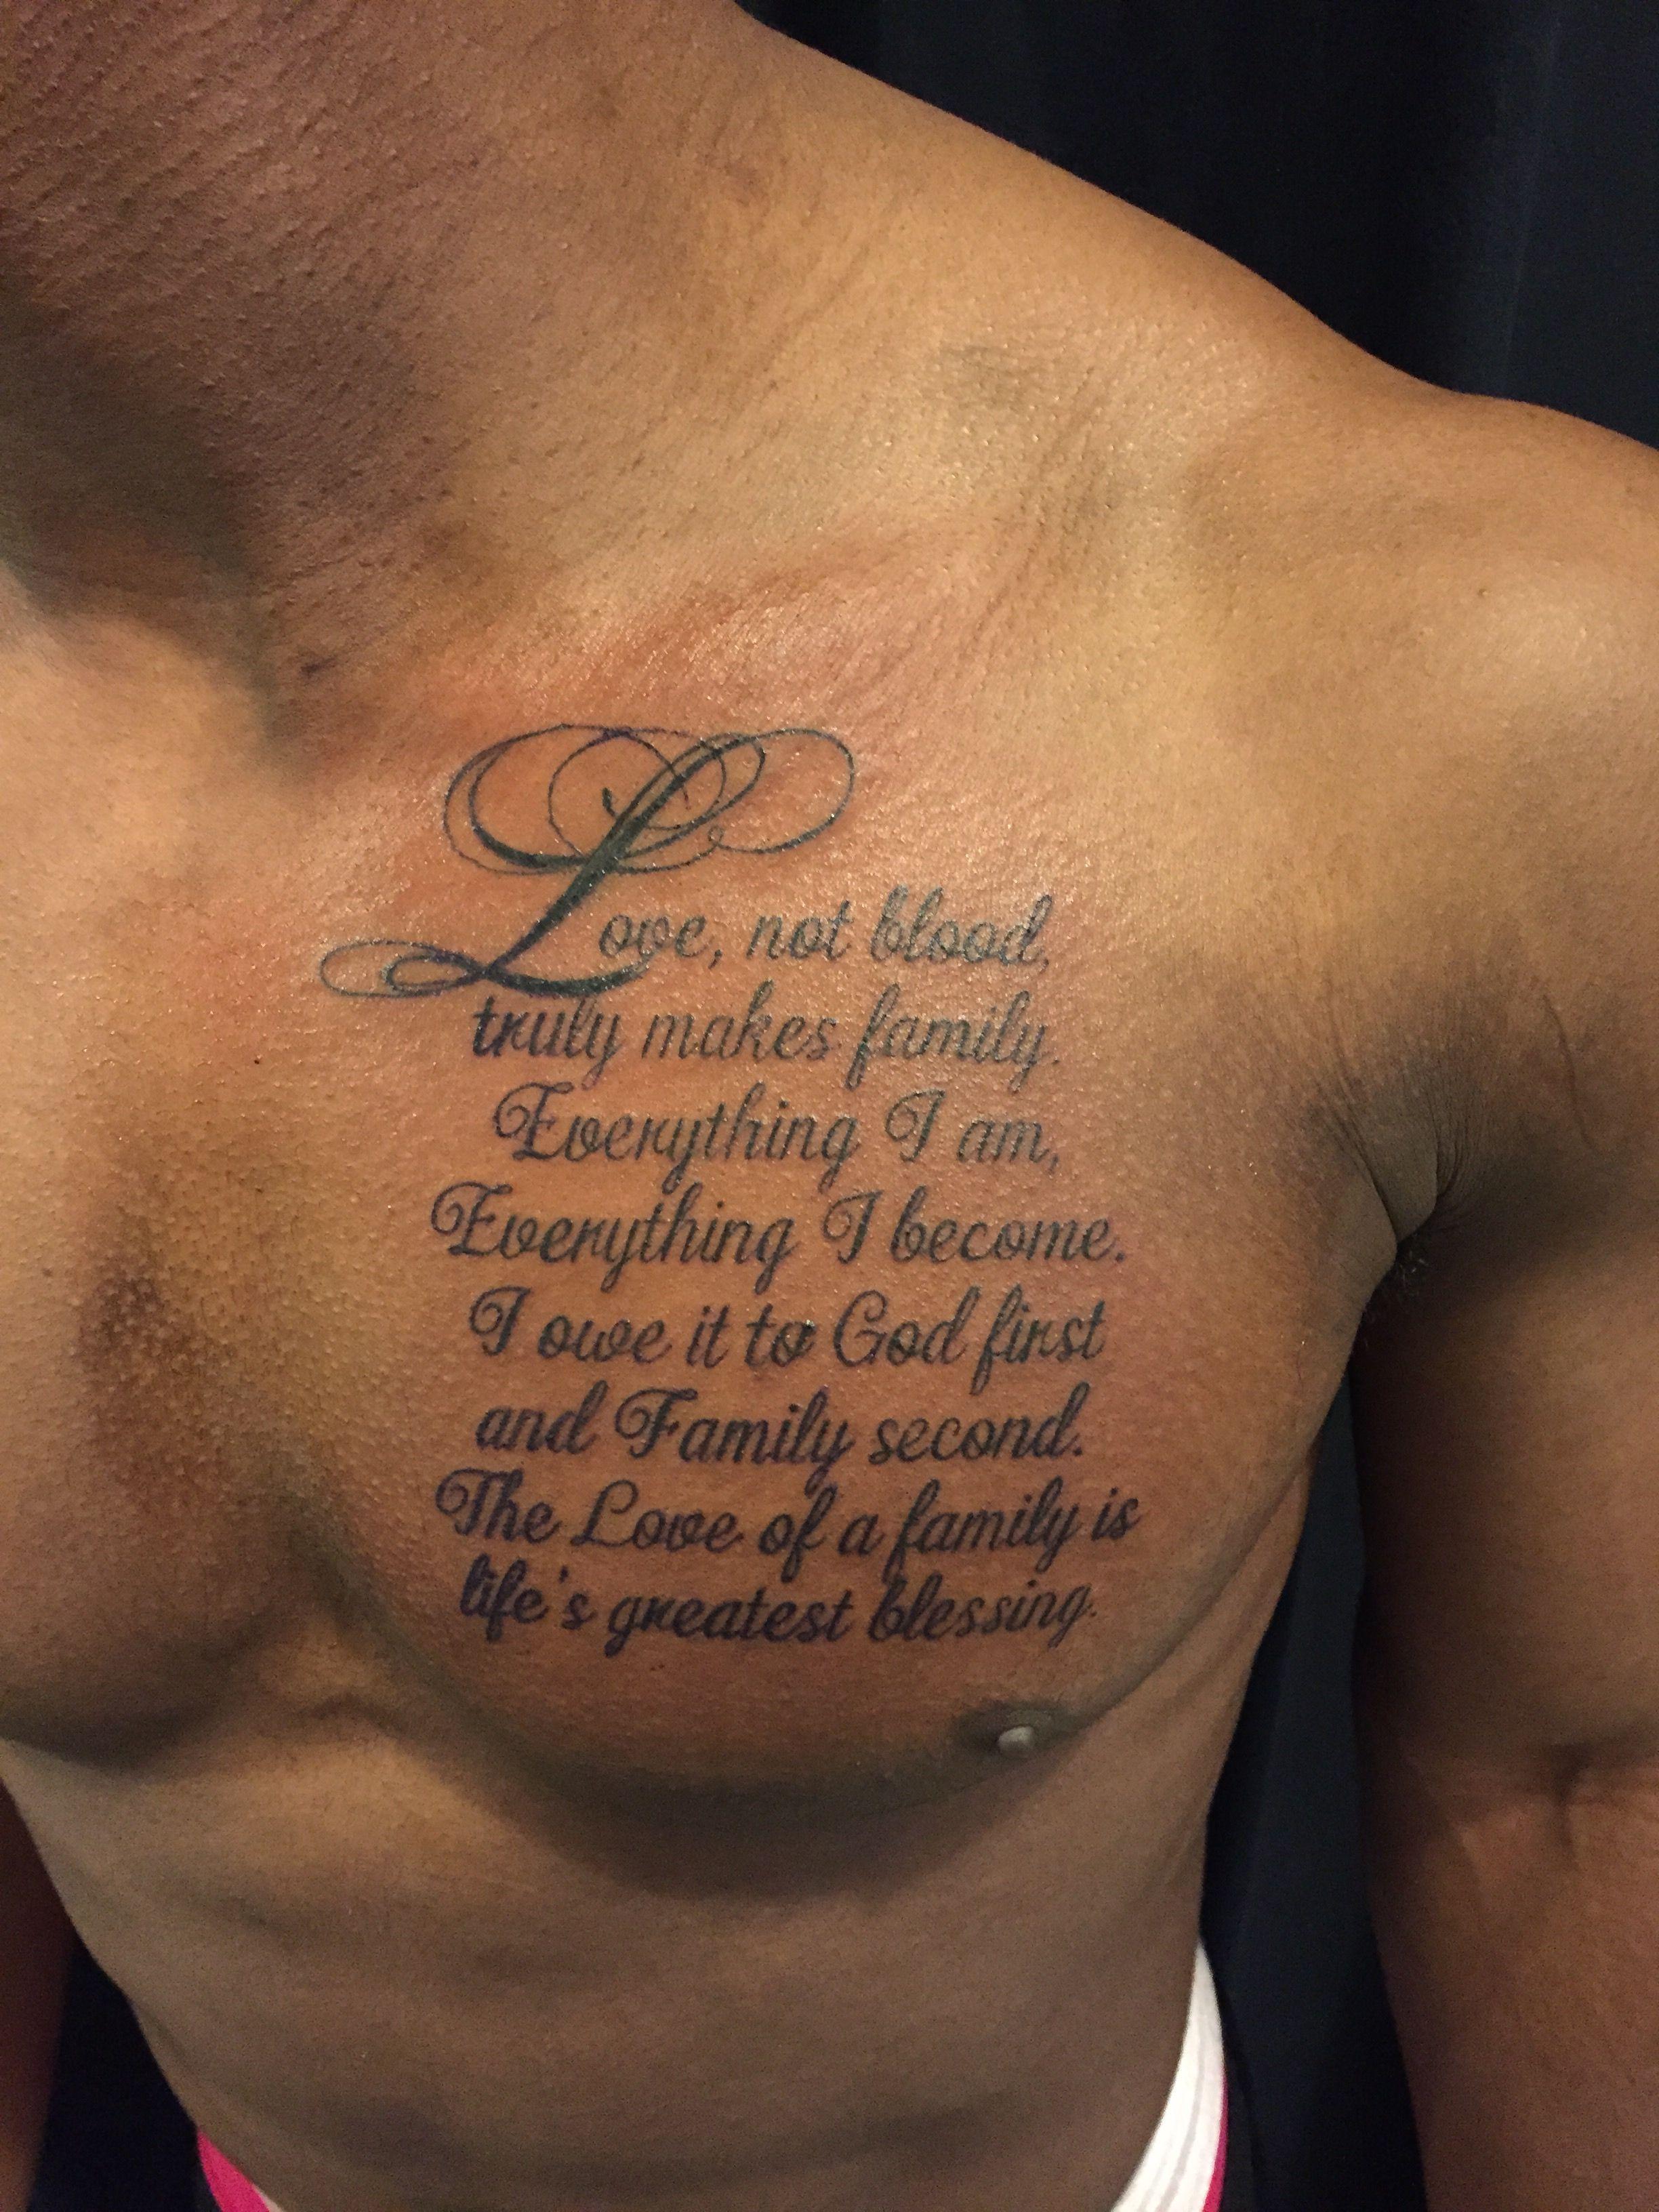 Script On Chest Tattoo Artist Nina Dreamworx Ink 3883 Rutherford Rd Unit 11 Vaughan On L4l 9r8 Chest Tattoo Men Chest Tattoo Quotes Verse Tattoos